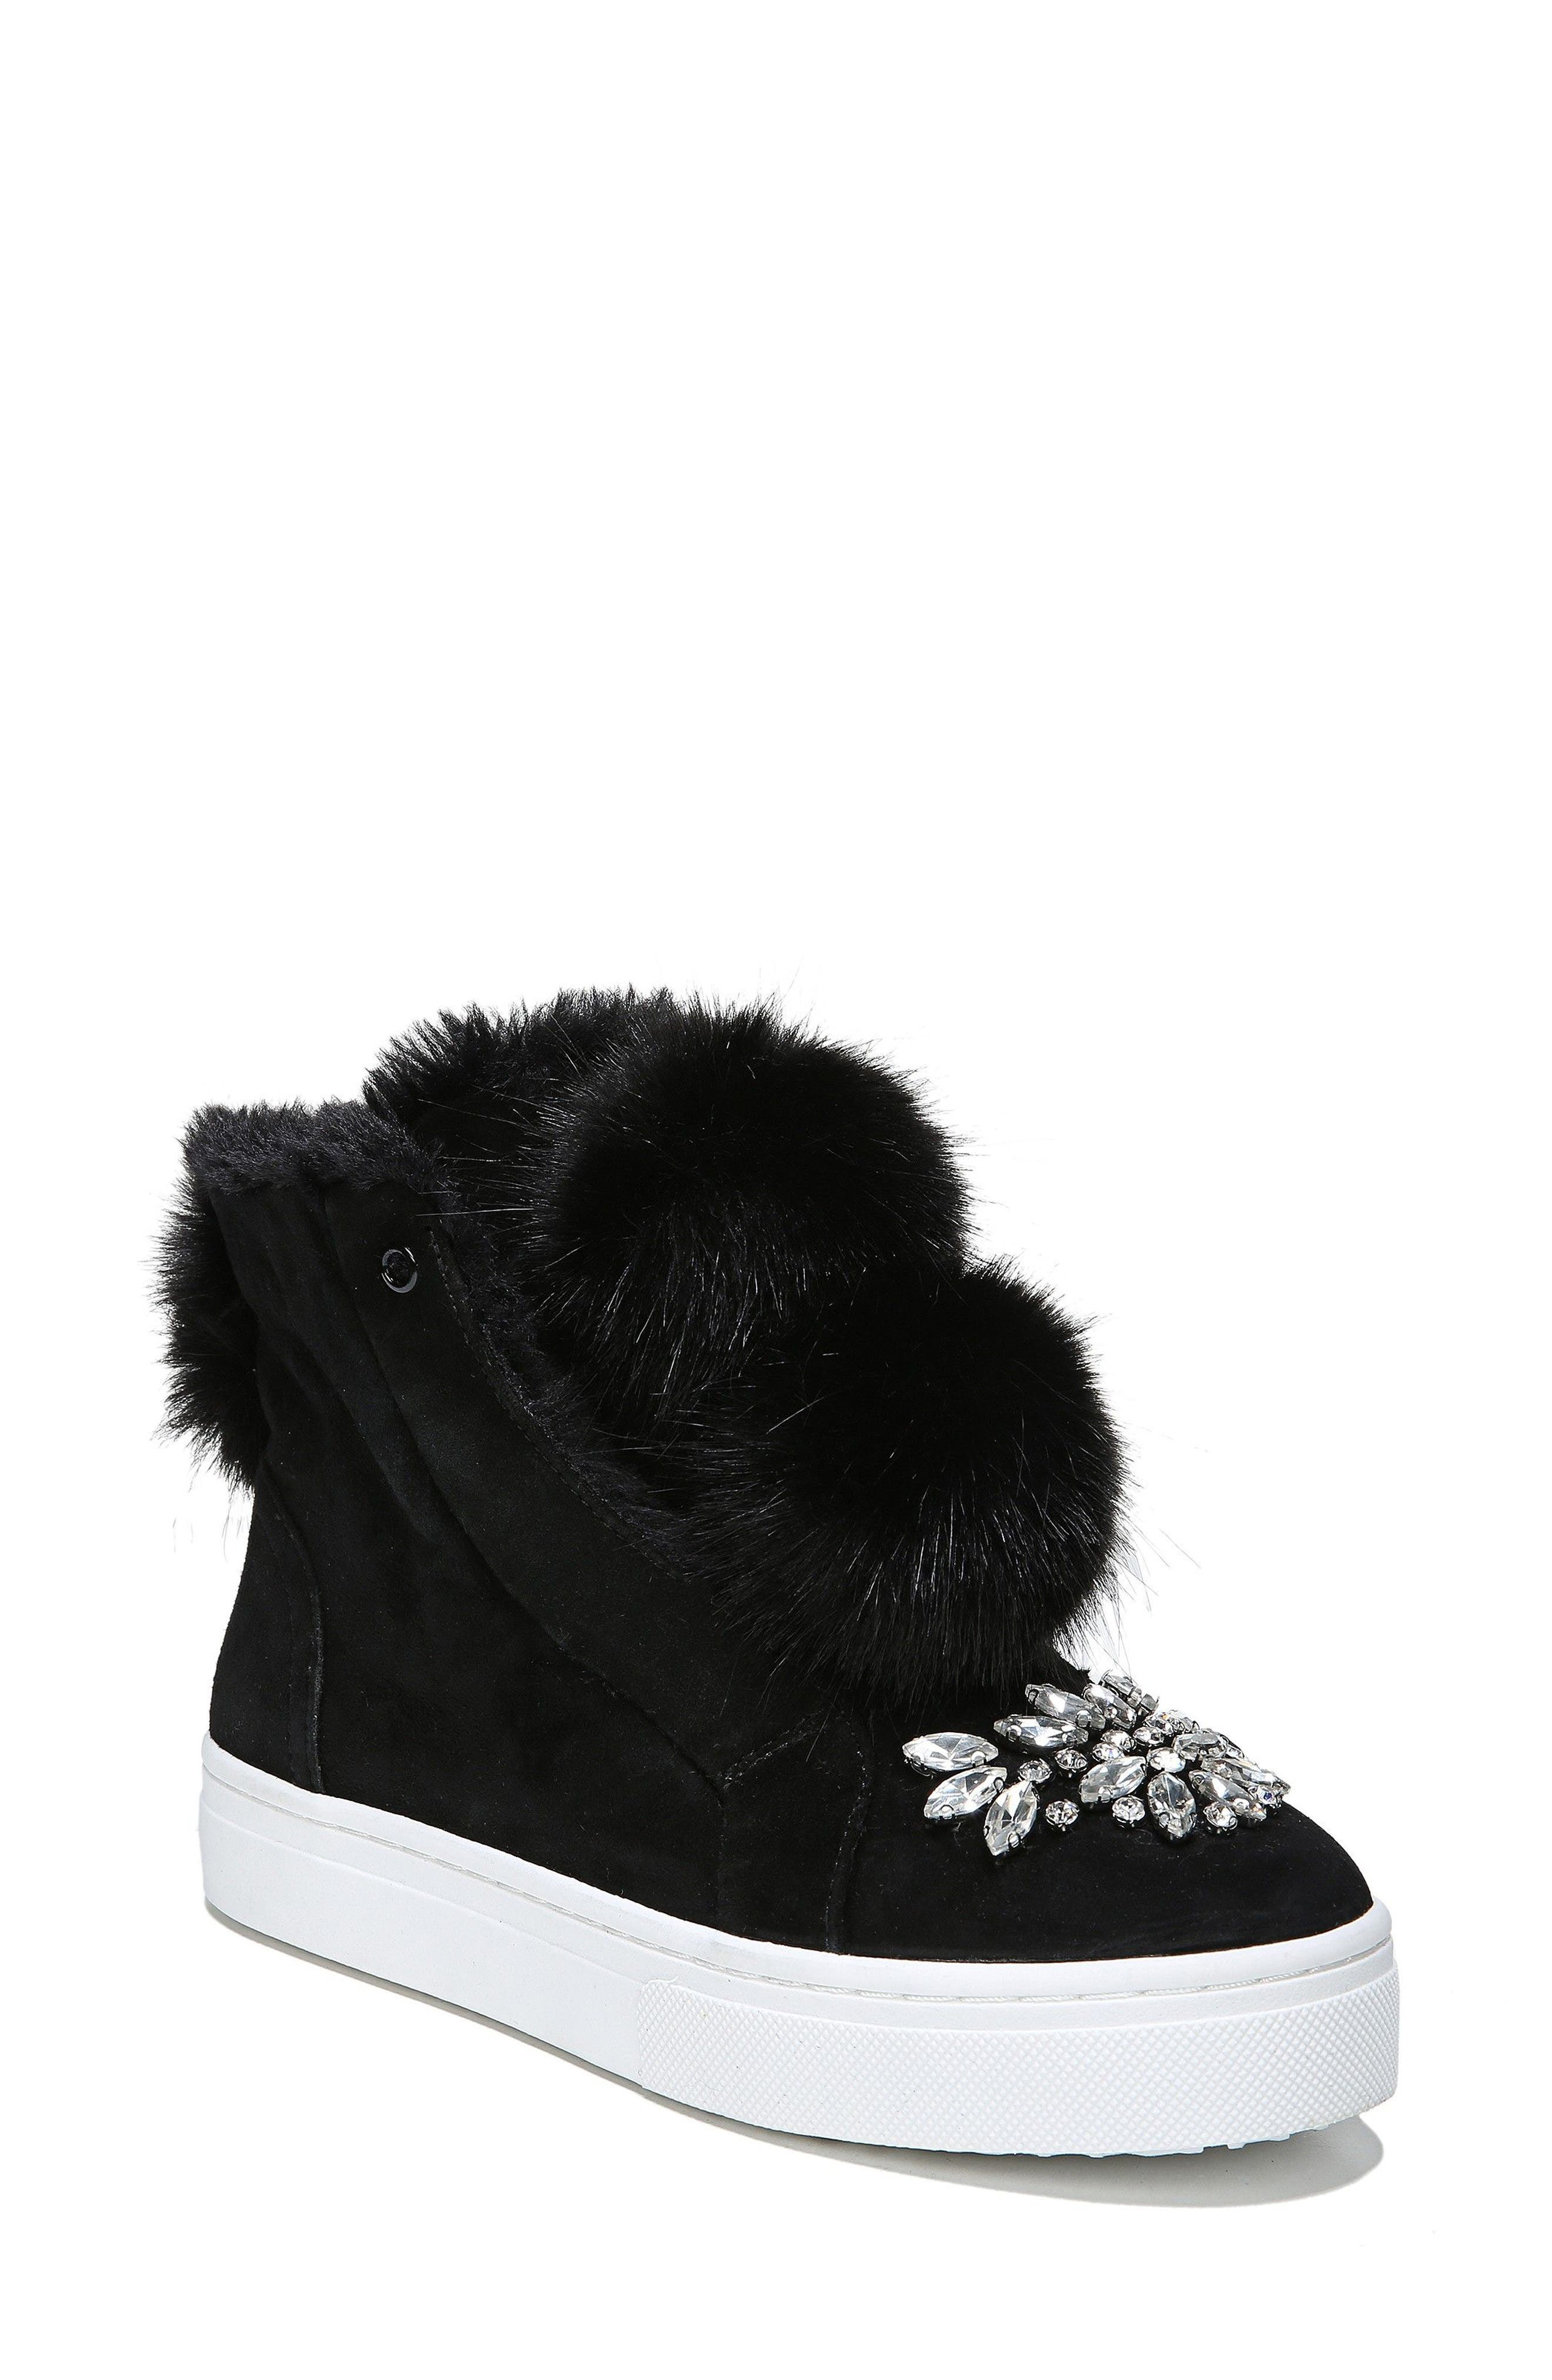 Leland Faux Fur Sneaker,                         Main,                         color, 001